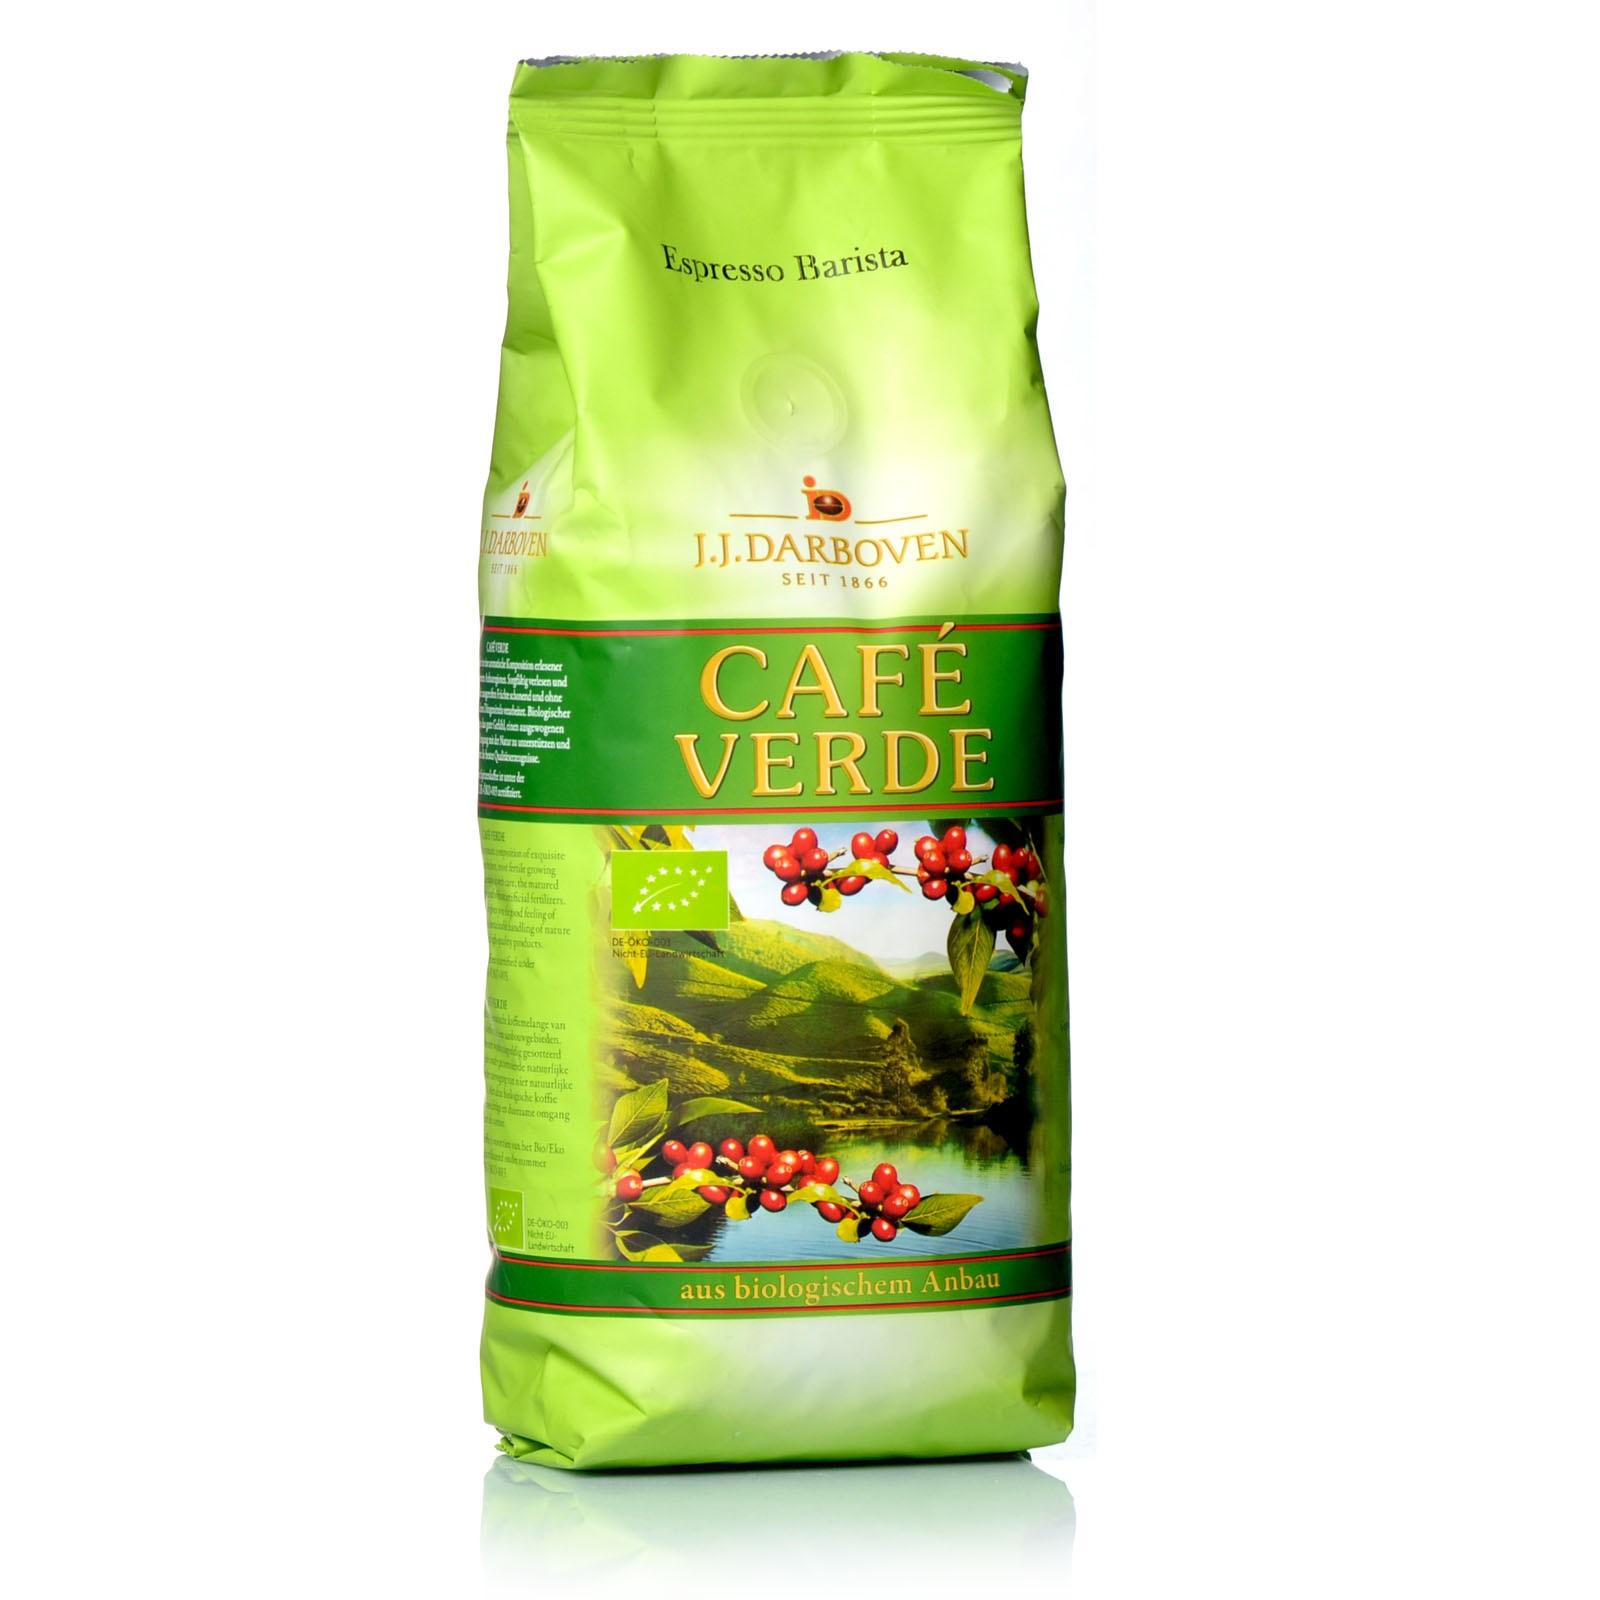 Darboven Café Verde Espresso Bio Barista 500 g ganze Bohnen